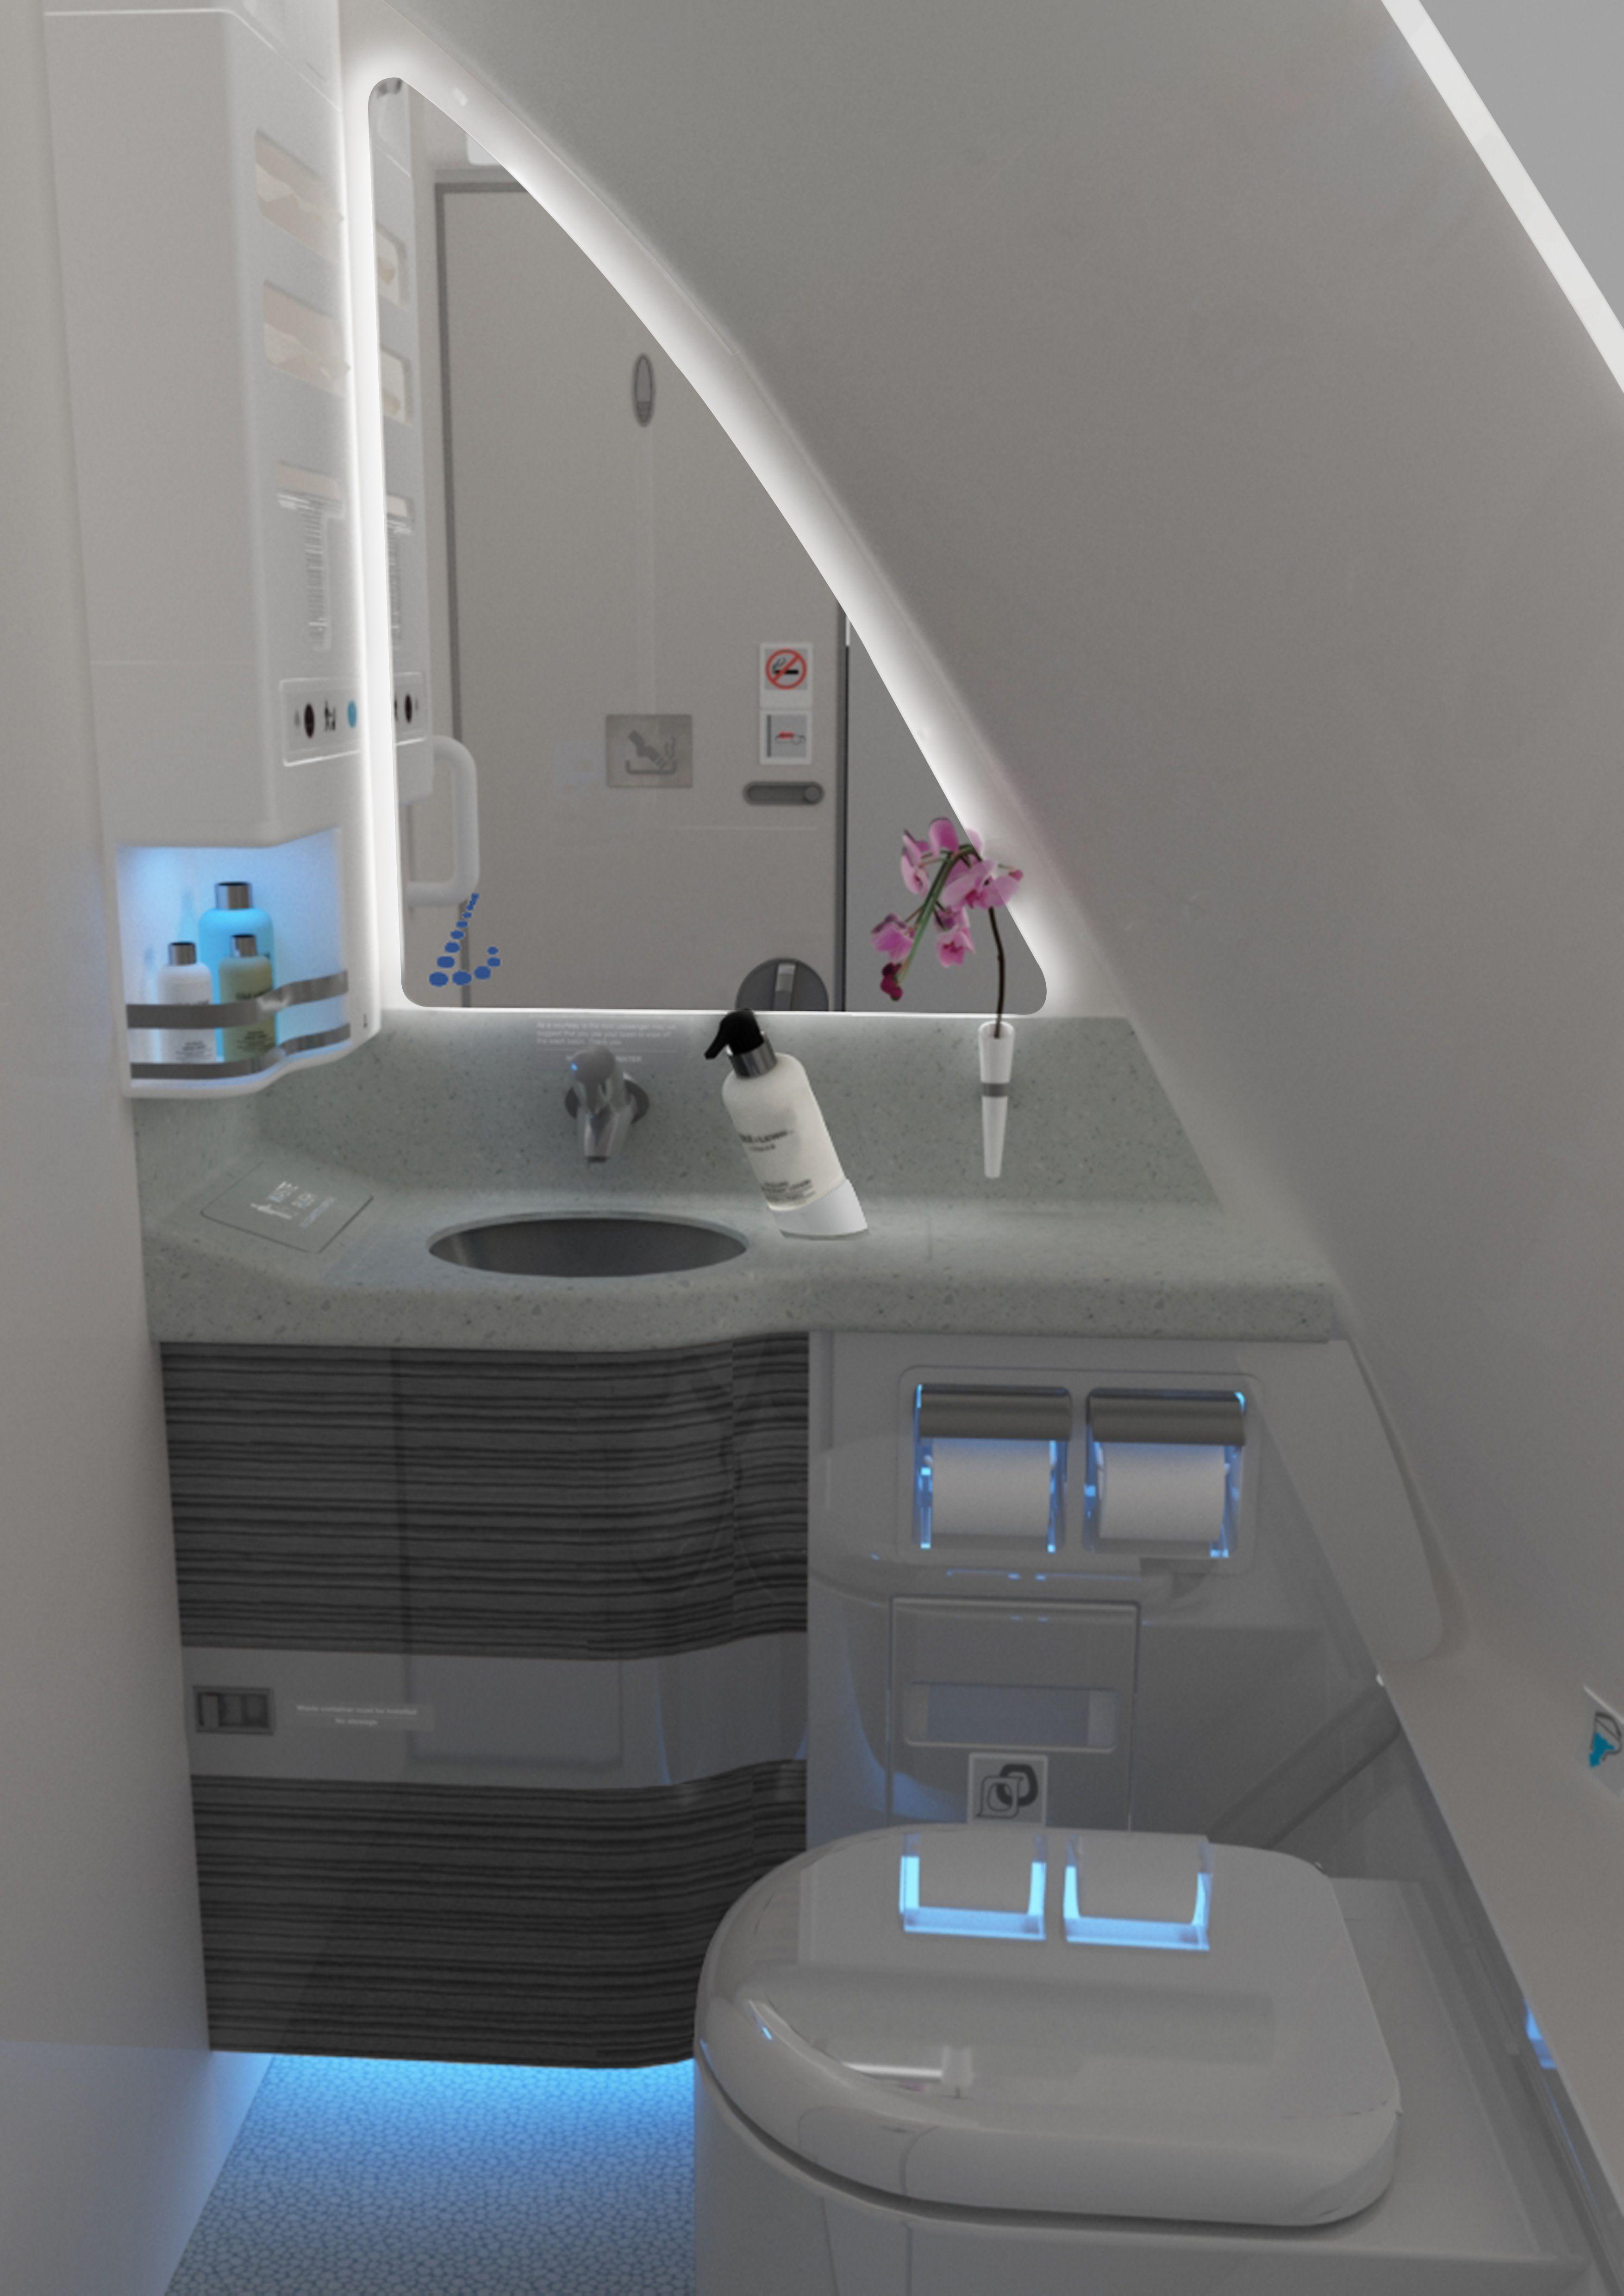 Handicap Bathroom Airplane pinvilo_vilo on luxury | pinterest | falcons and toilet